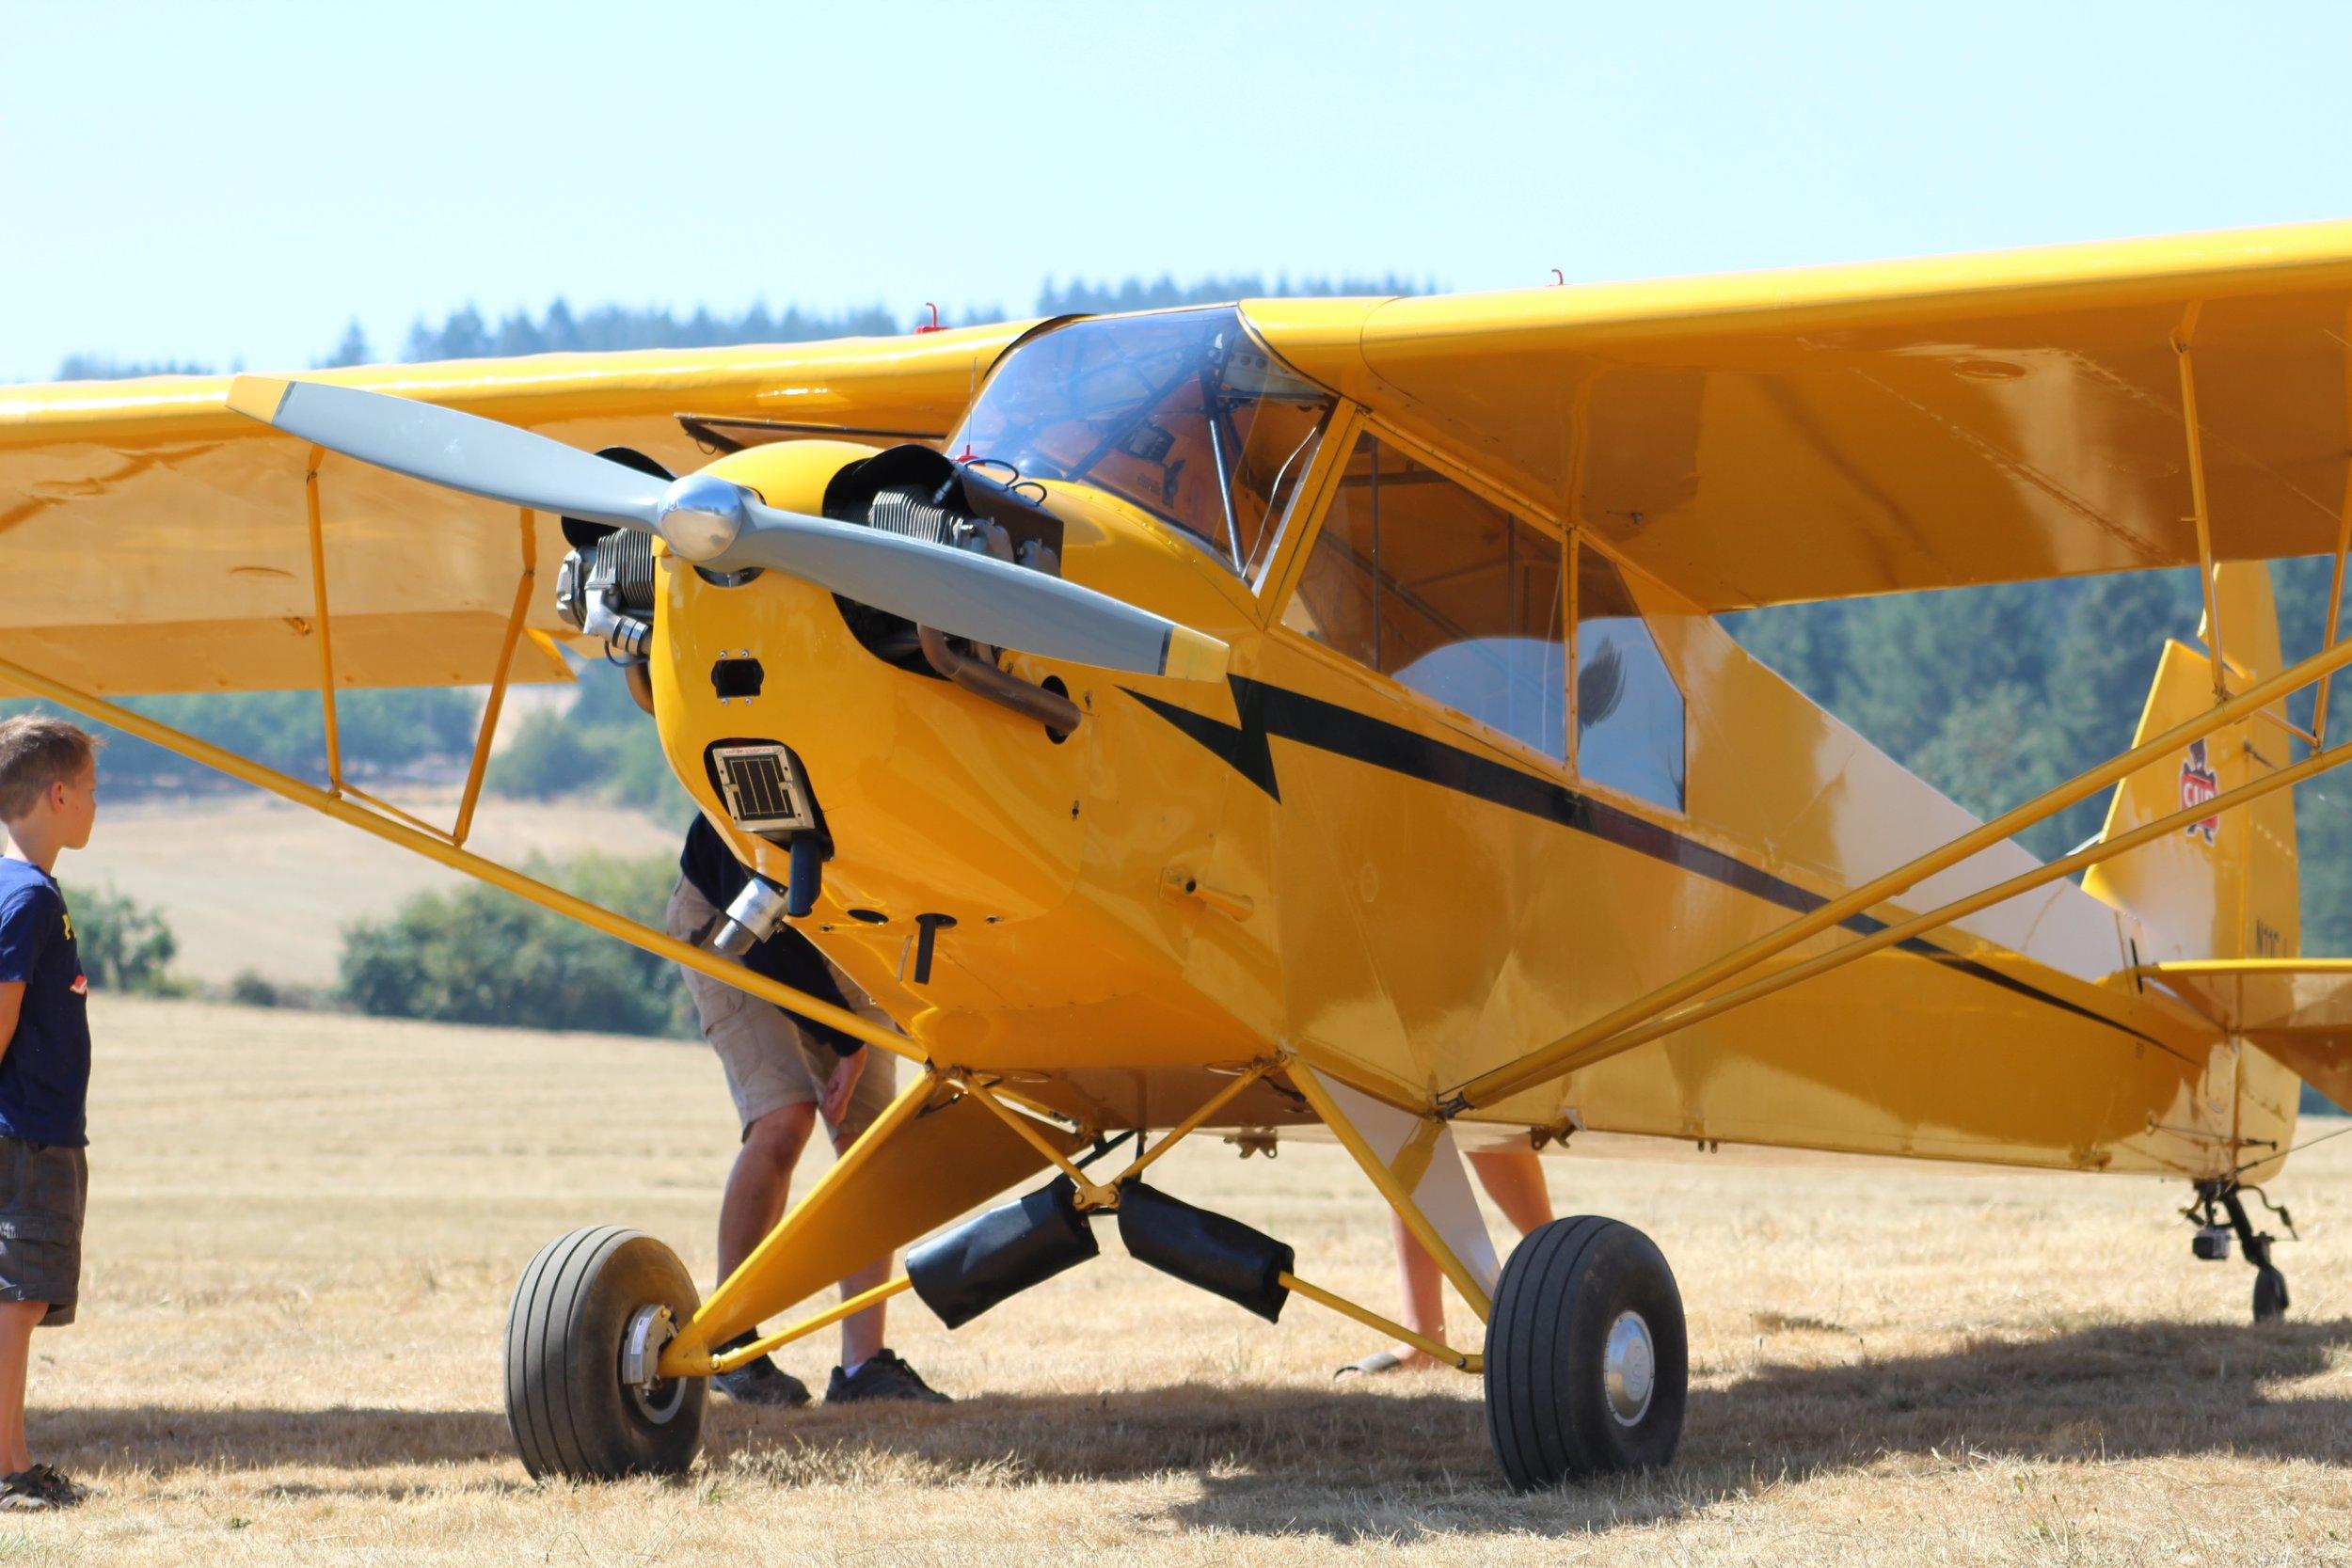 Airplane_0971.jpg